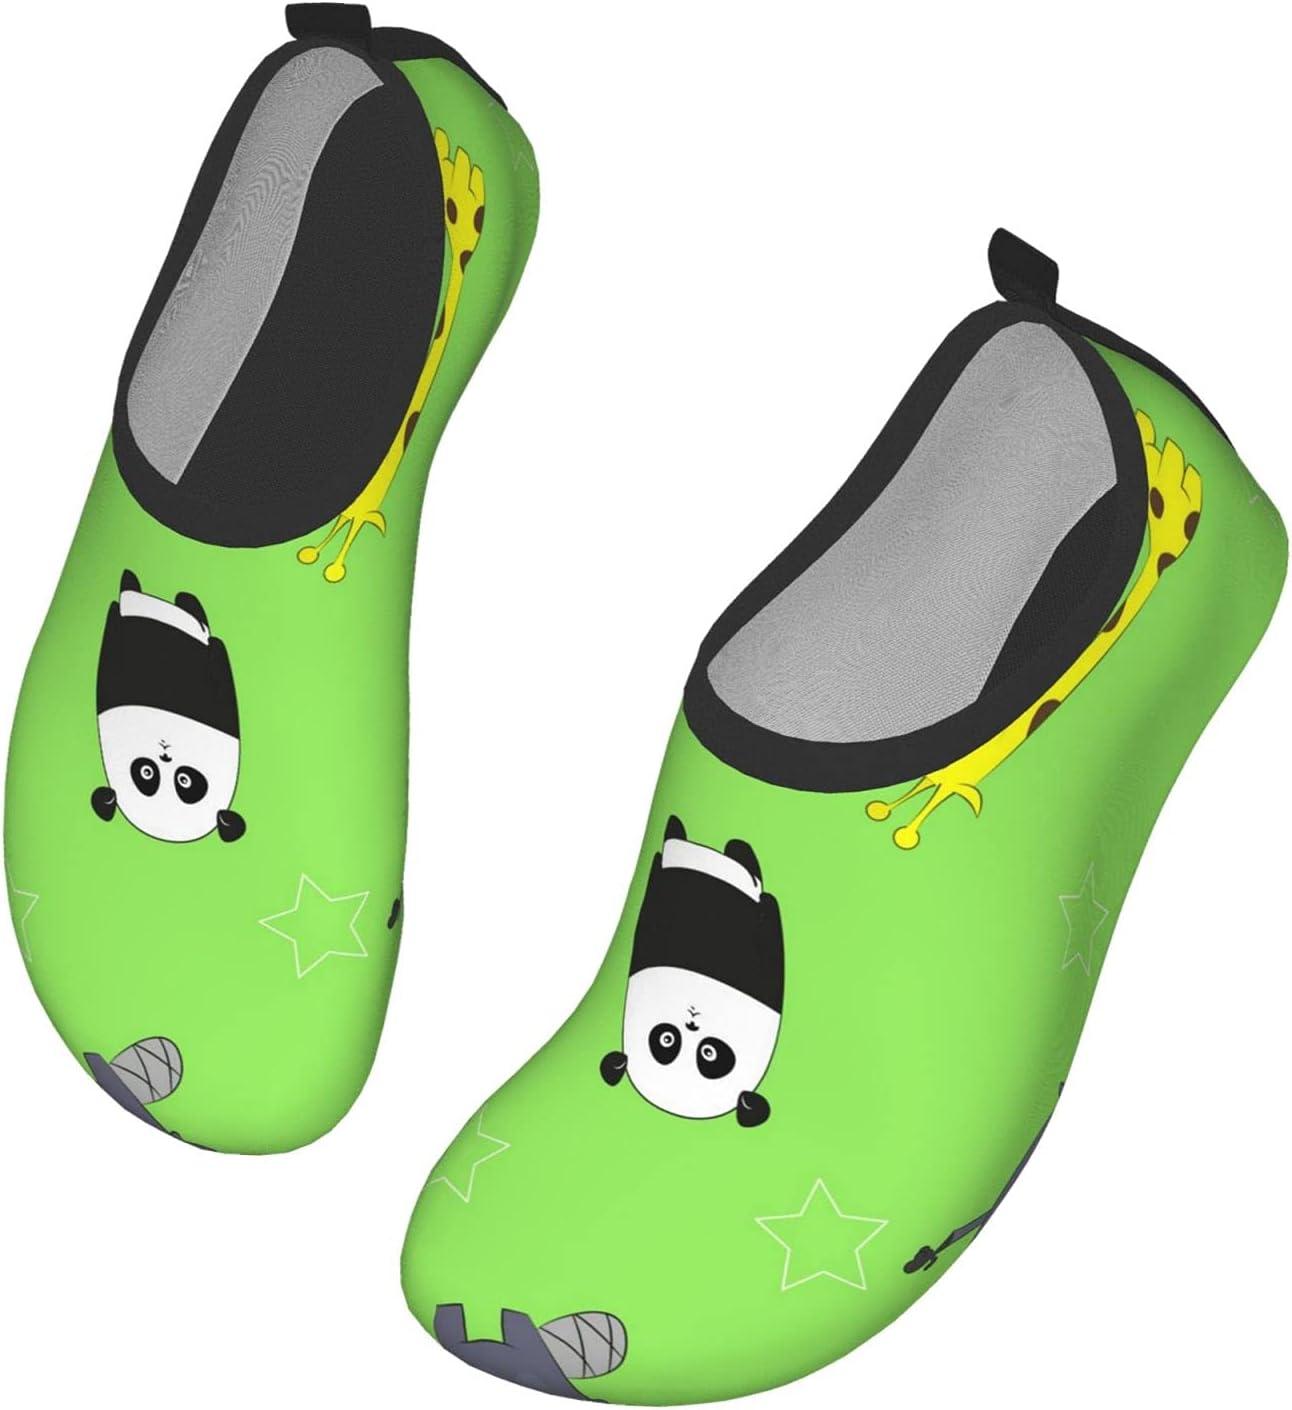 NA Cute Animals Pattern Men's Women's Water Shoes Barefoot Quick Dry Slip-On Aqua Socks for Yoga Beach Sports Swim Surf